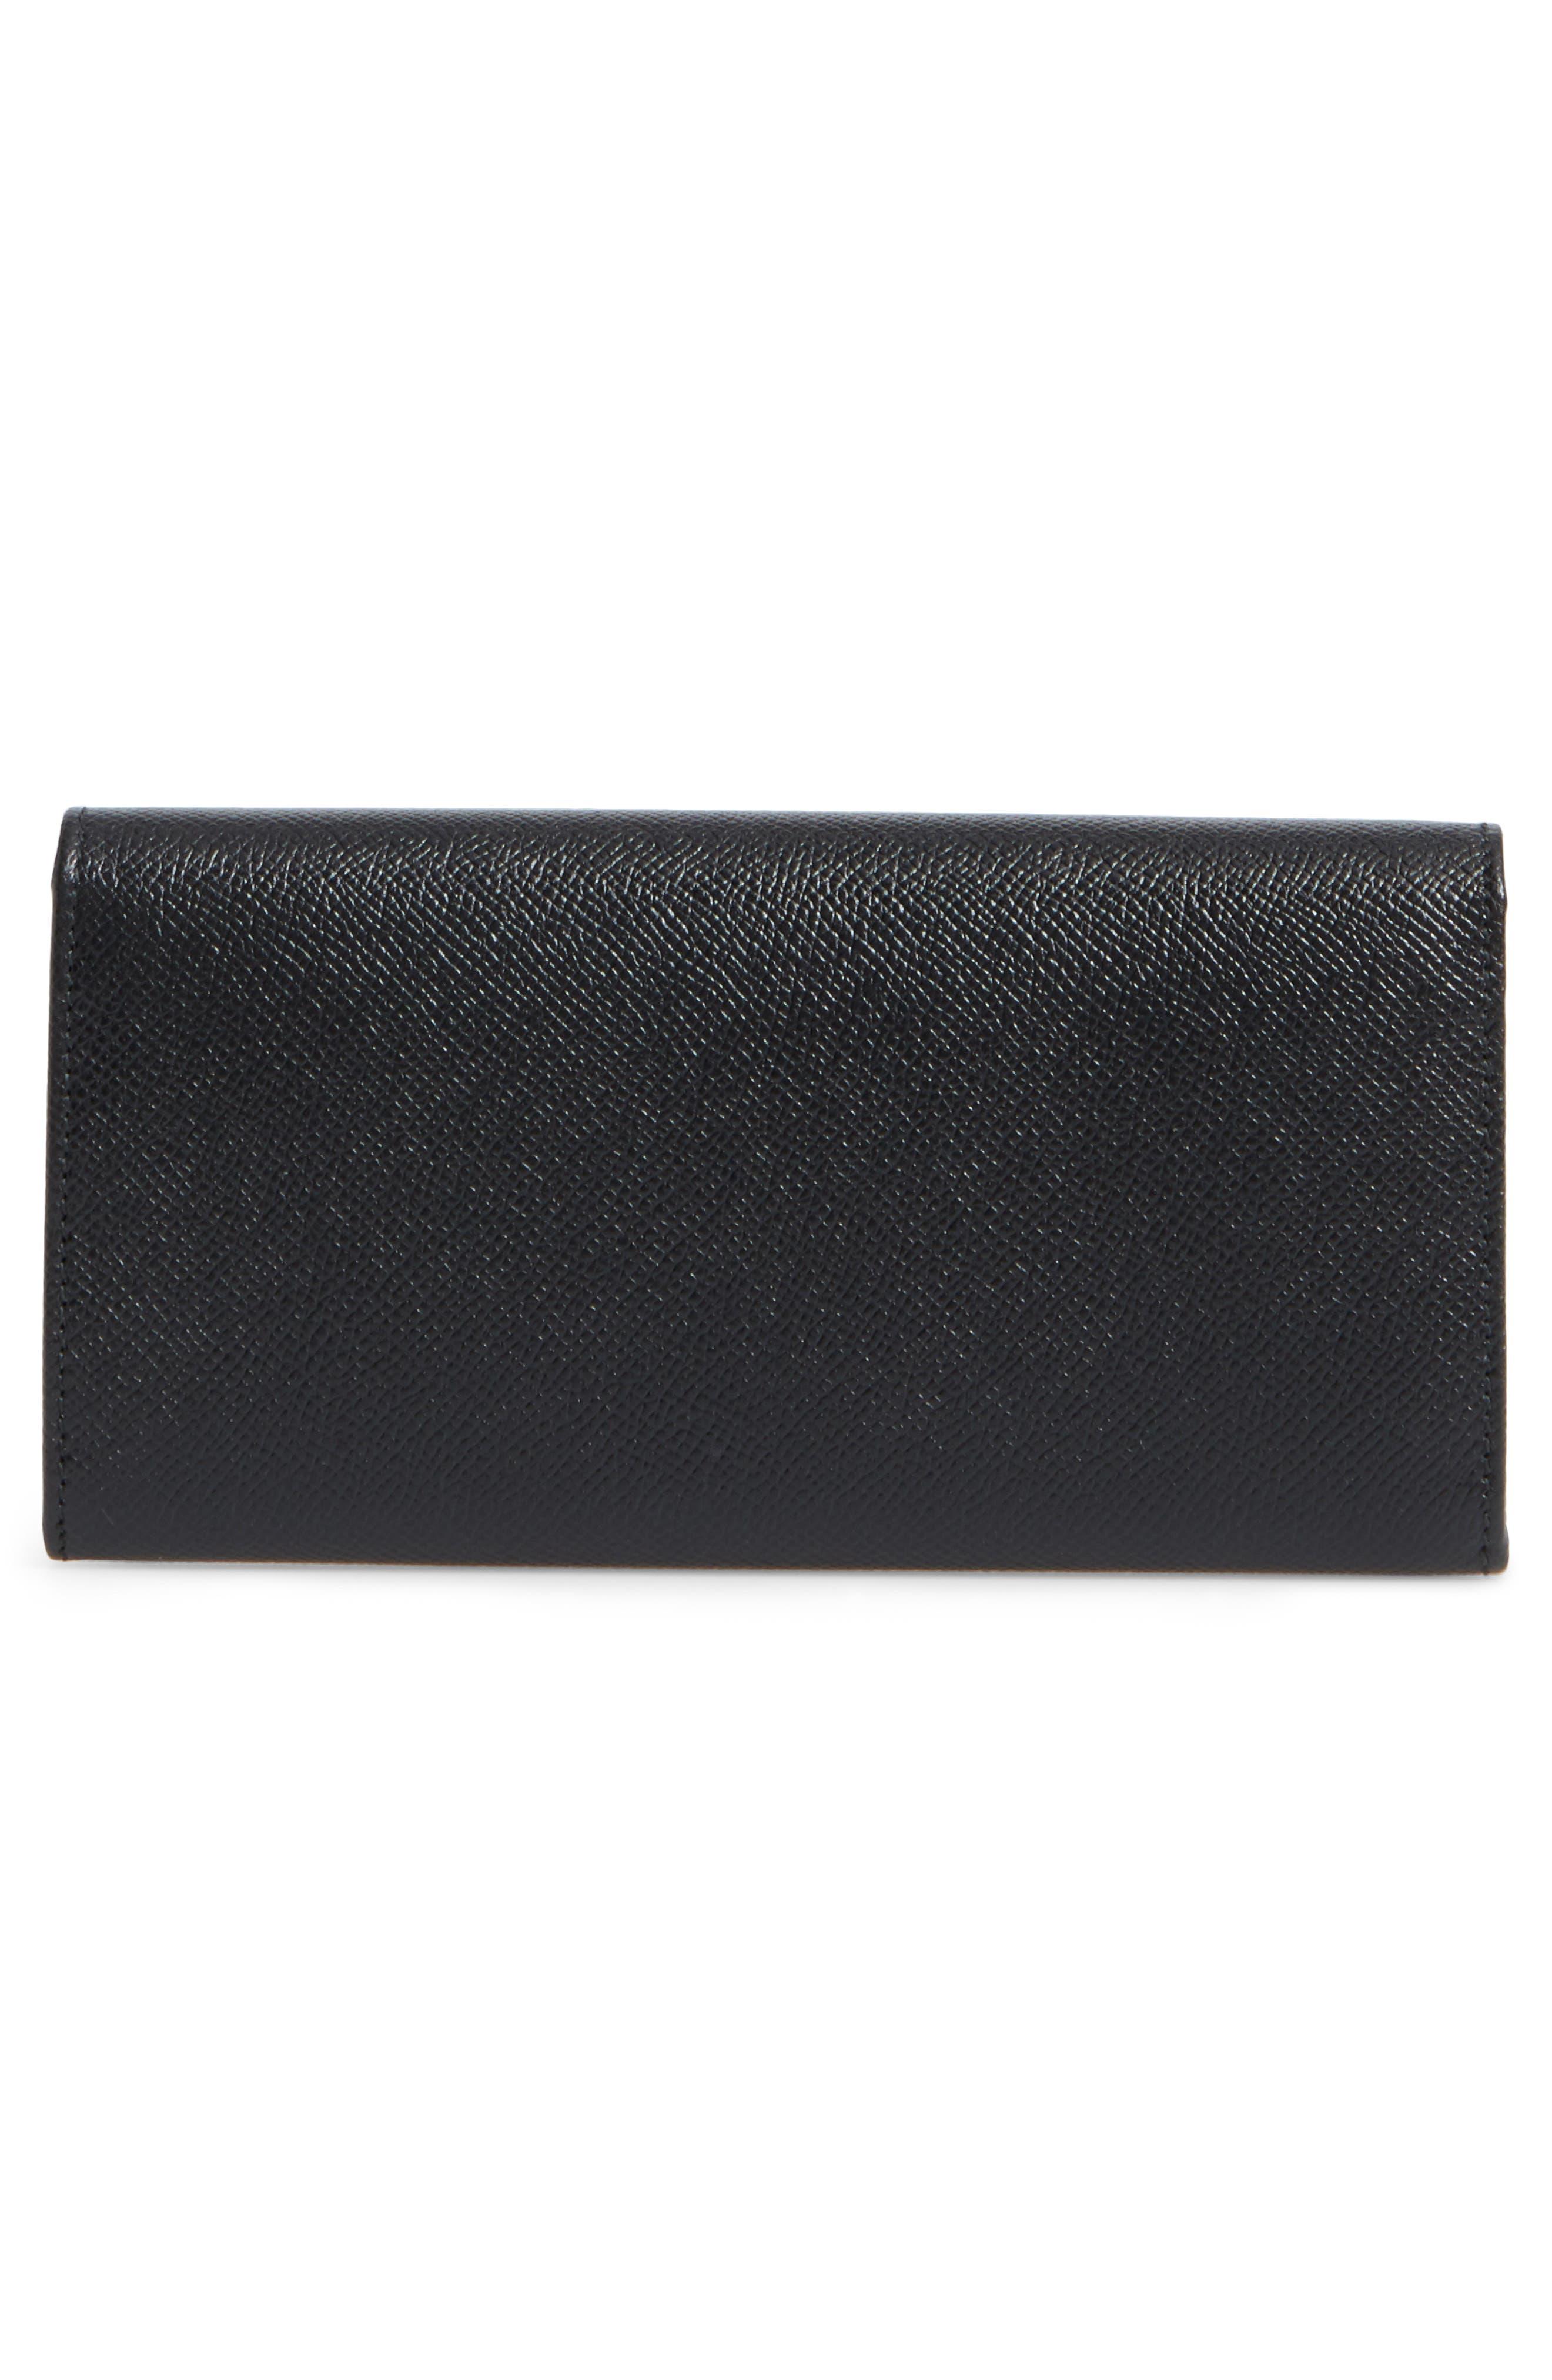 Bar Saffiano Calfskin Wallet,                             Alternate thumbnail 4, color,